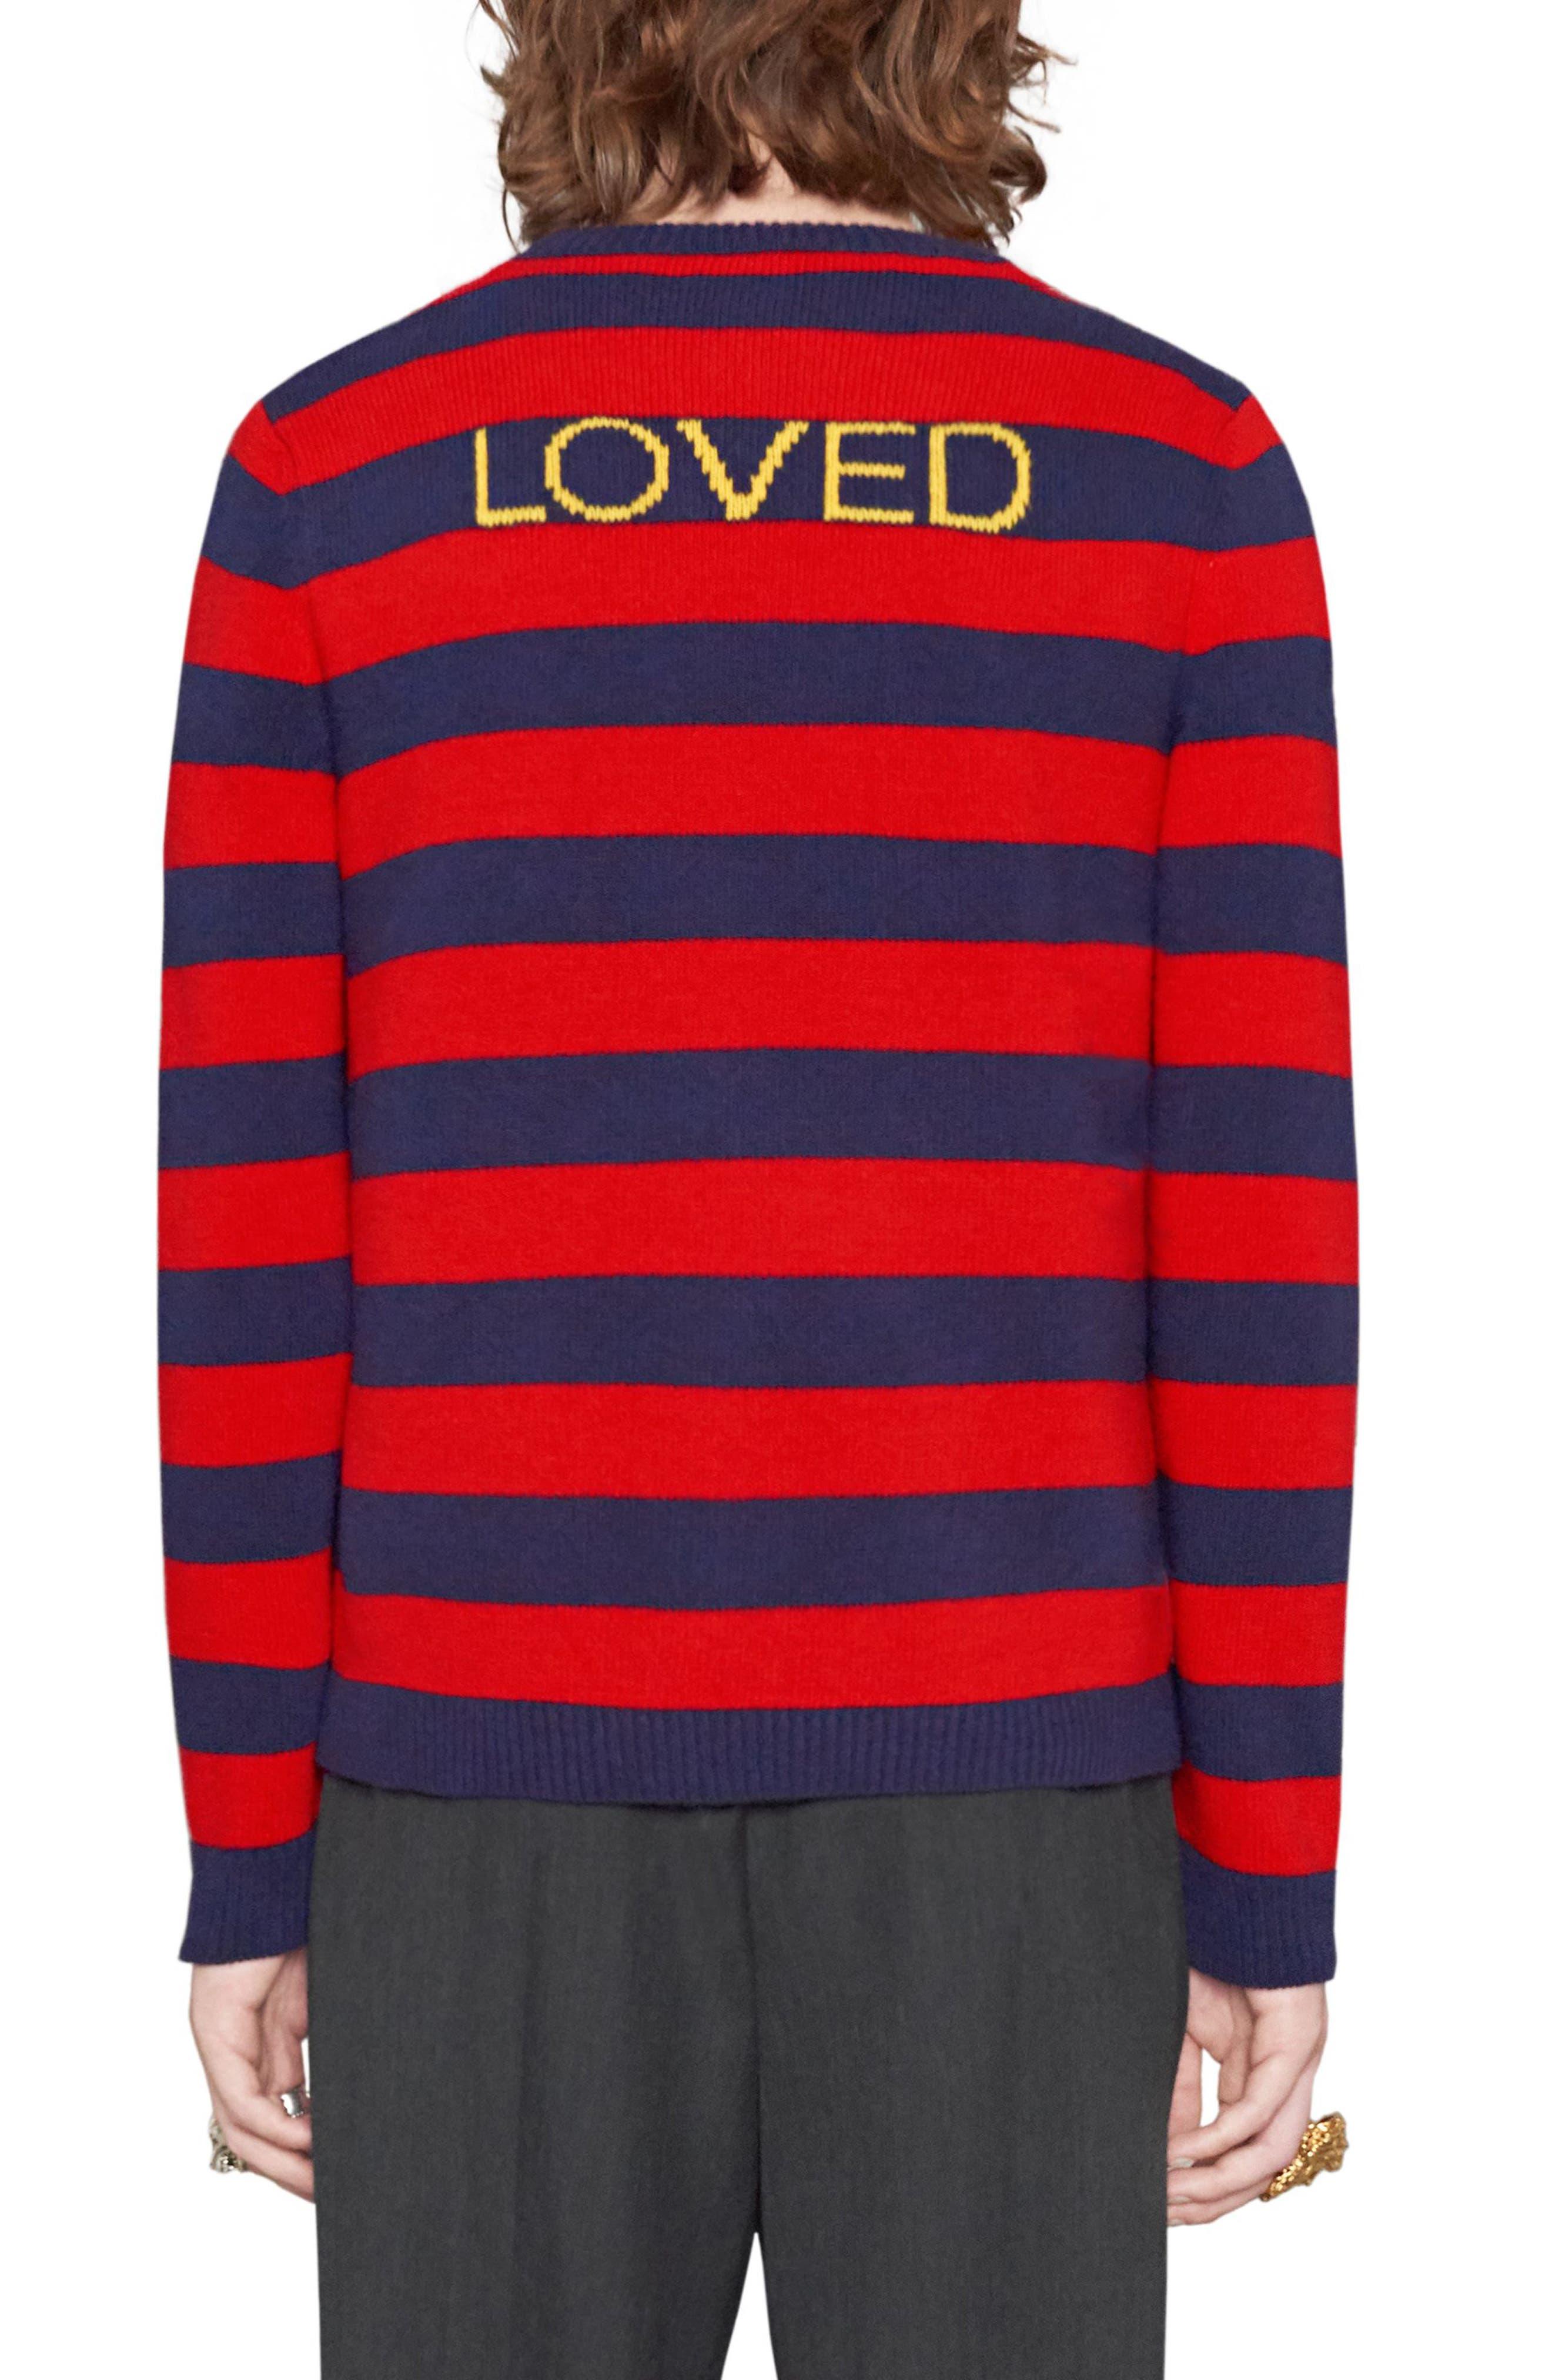 Stripe Bee Wool Crewneck Sweater,                             Alternate thumbnail 2, color,                             493